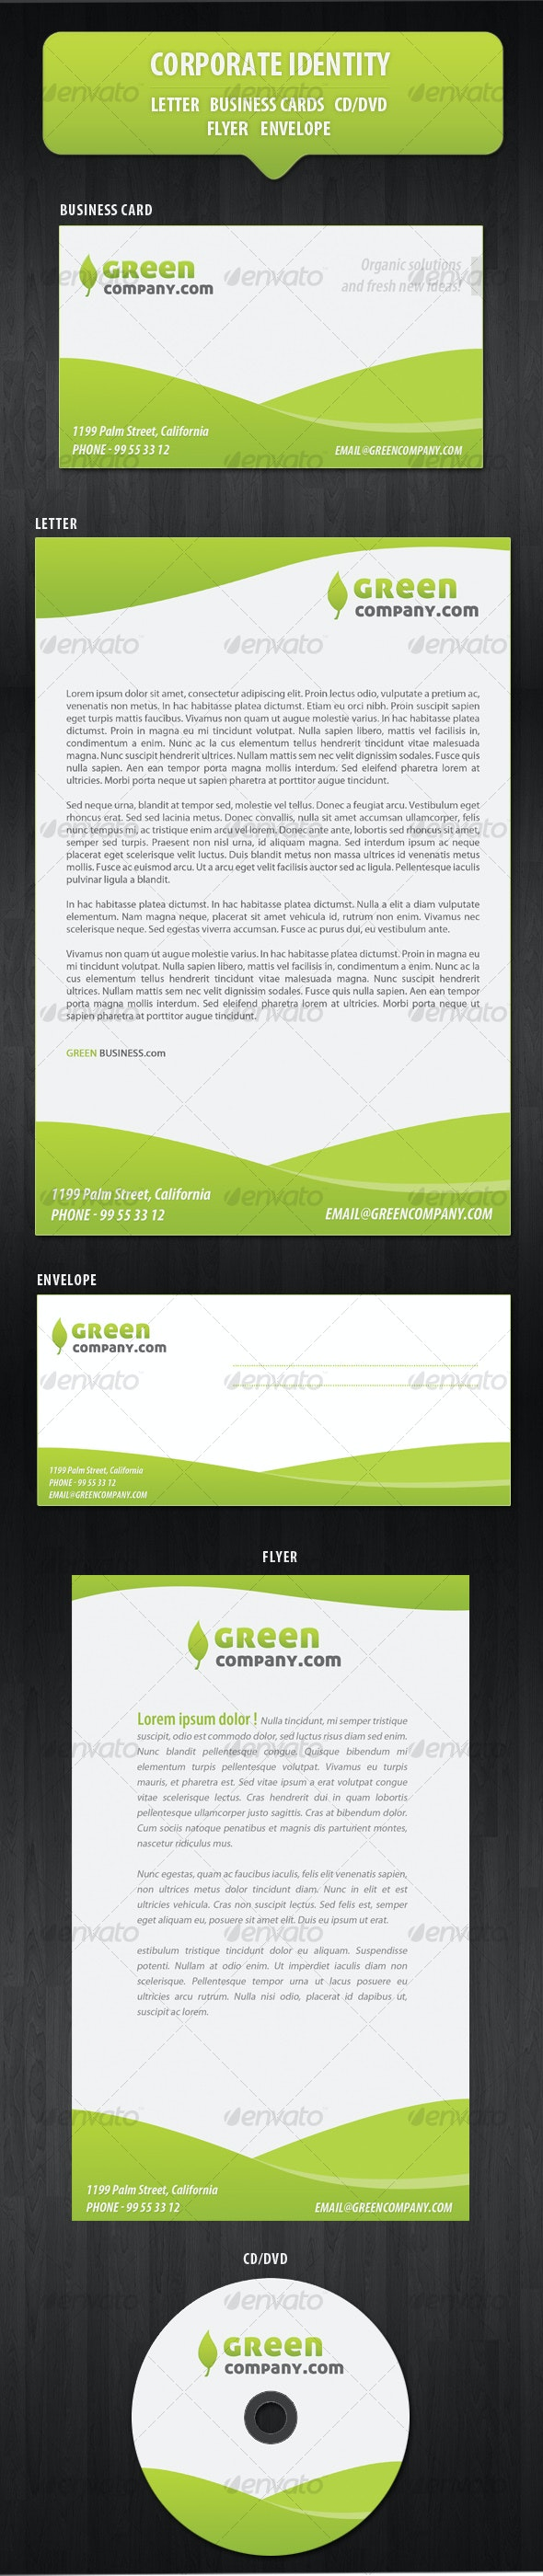 Green Company Corporate Identity/Stationery - Stationery Print Templates